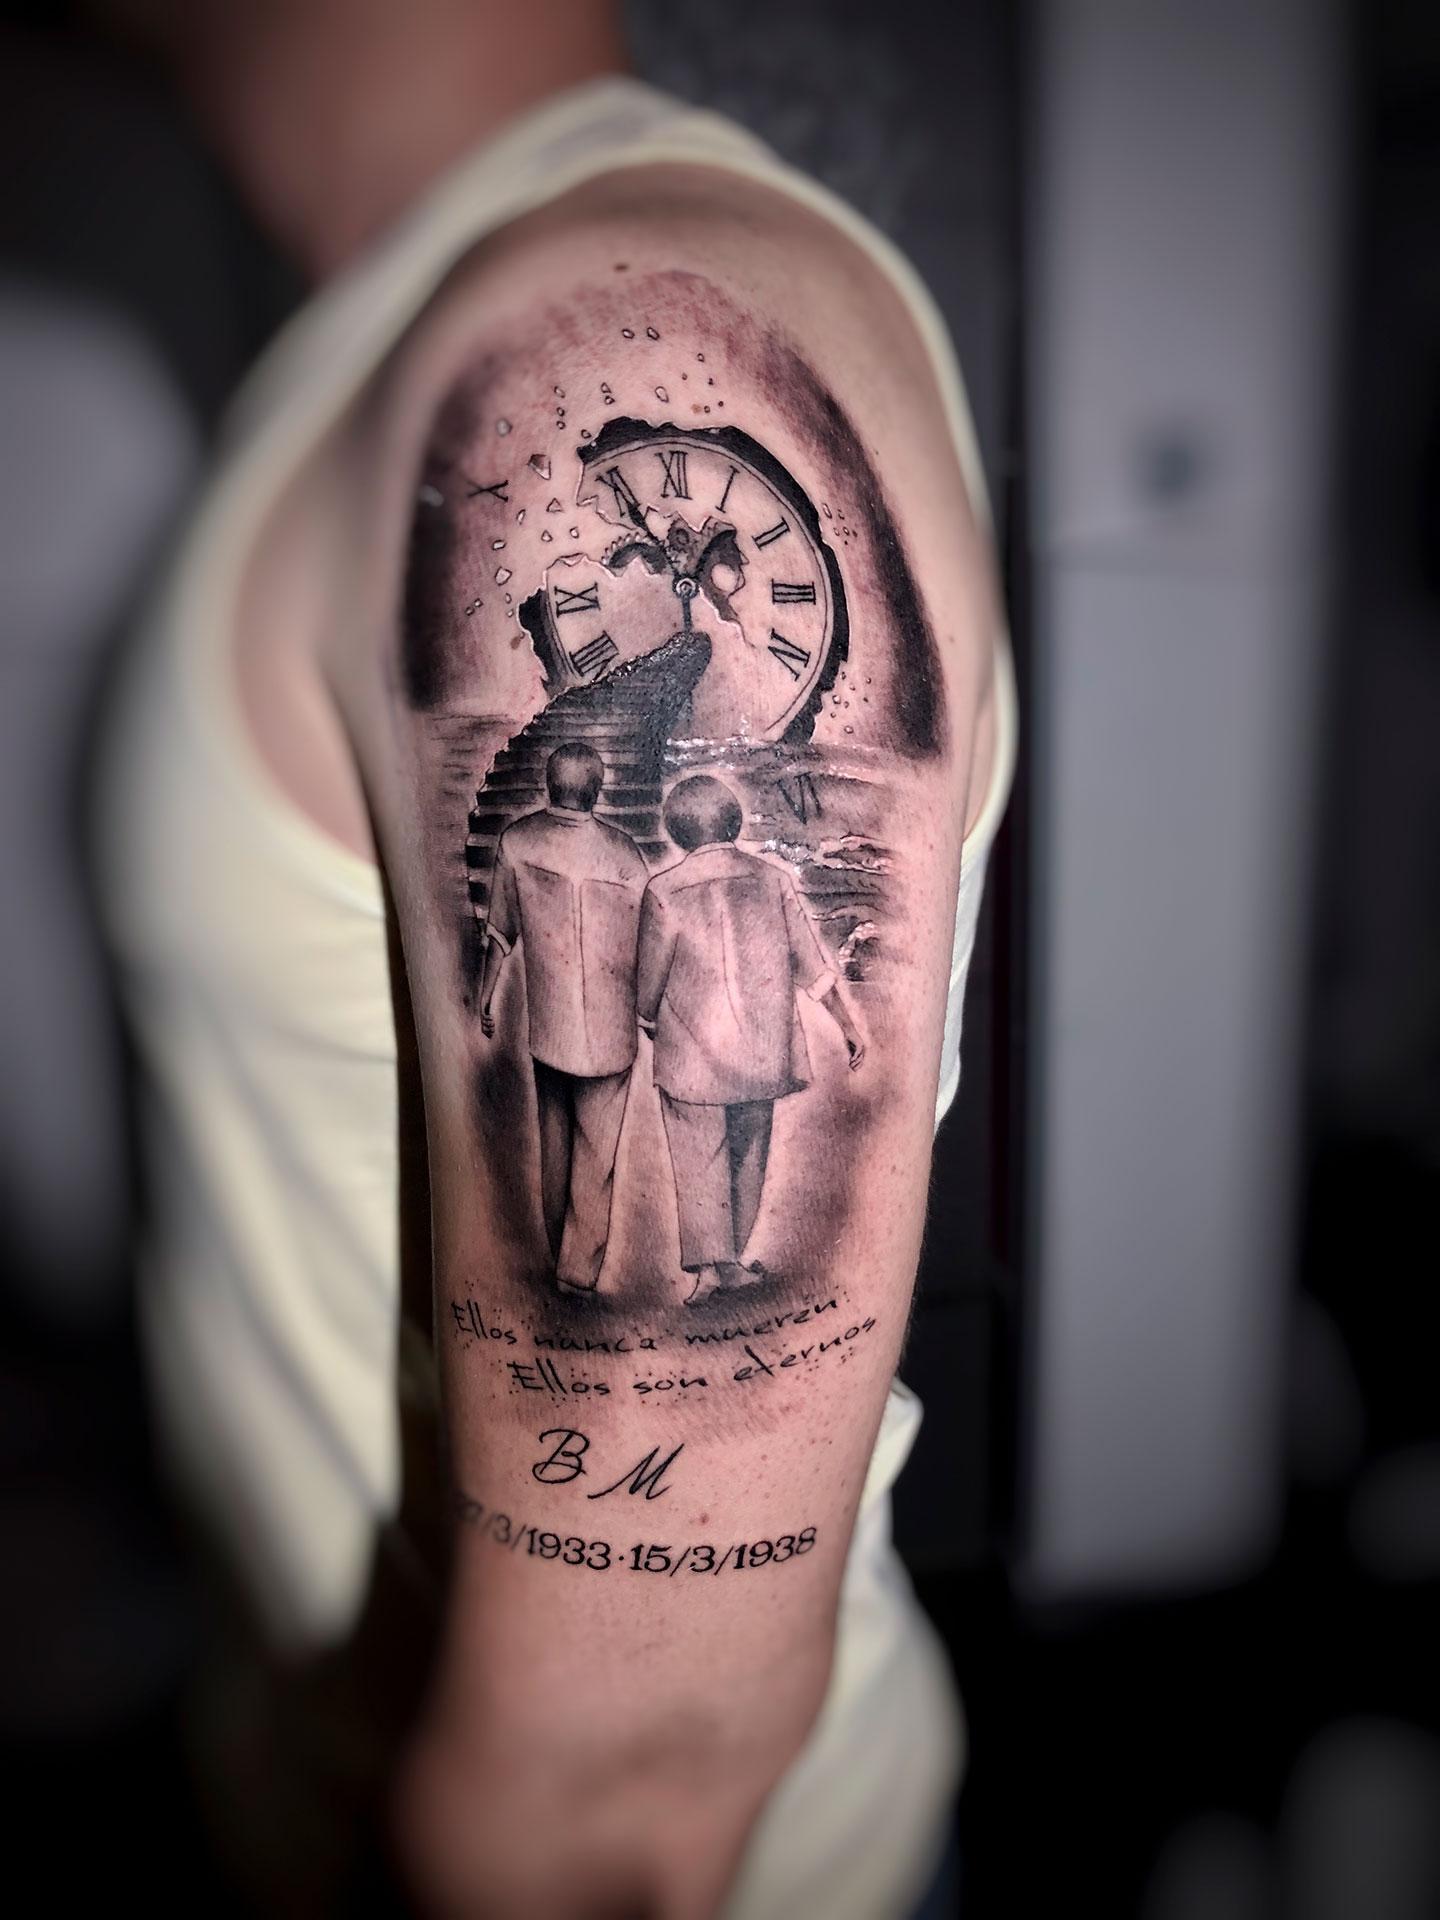 Tatuaje Tiempo